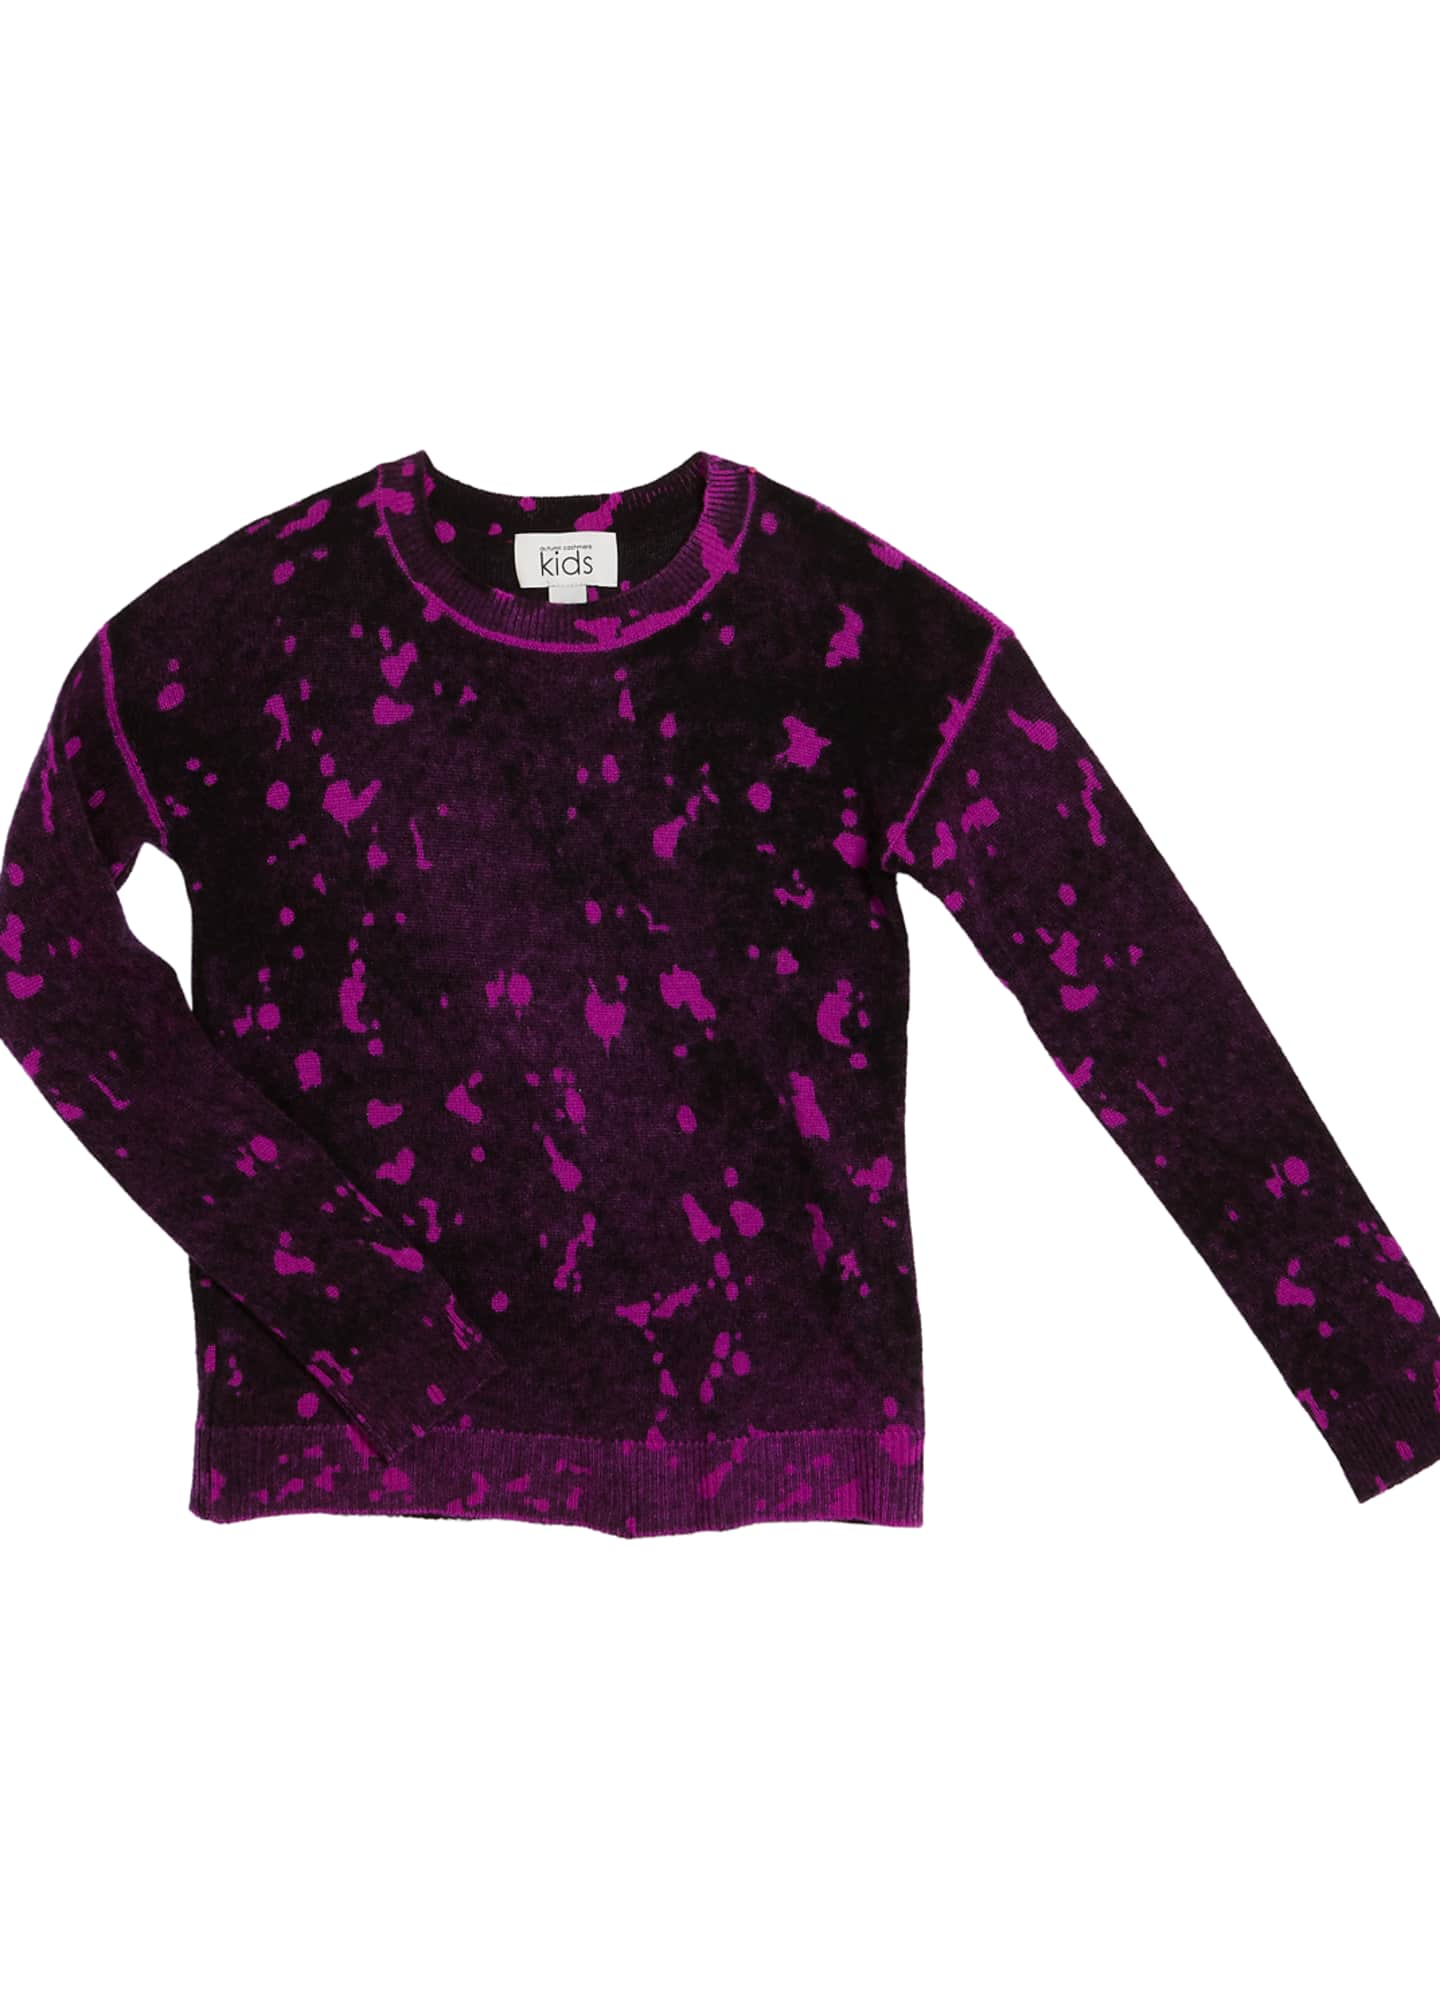 Autumn Cashmere Inked Splatter Paint Sweater, Size 8-16